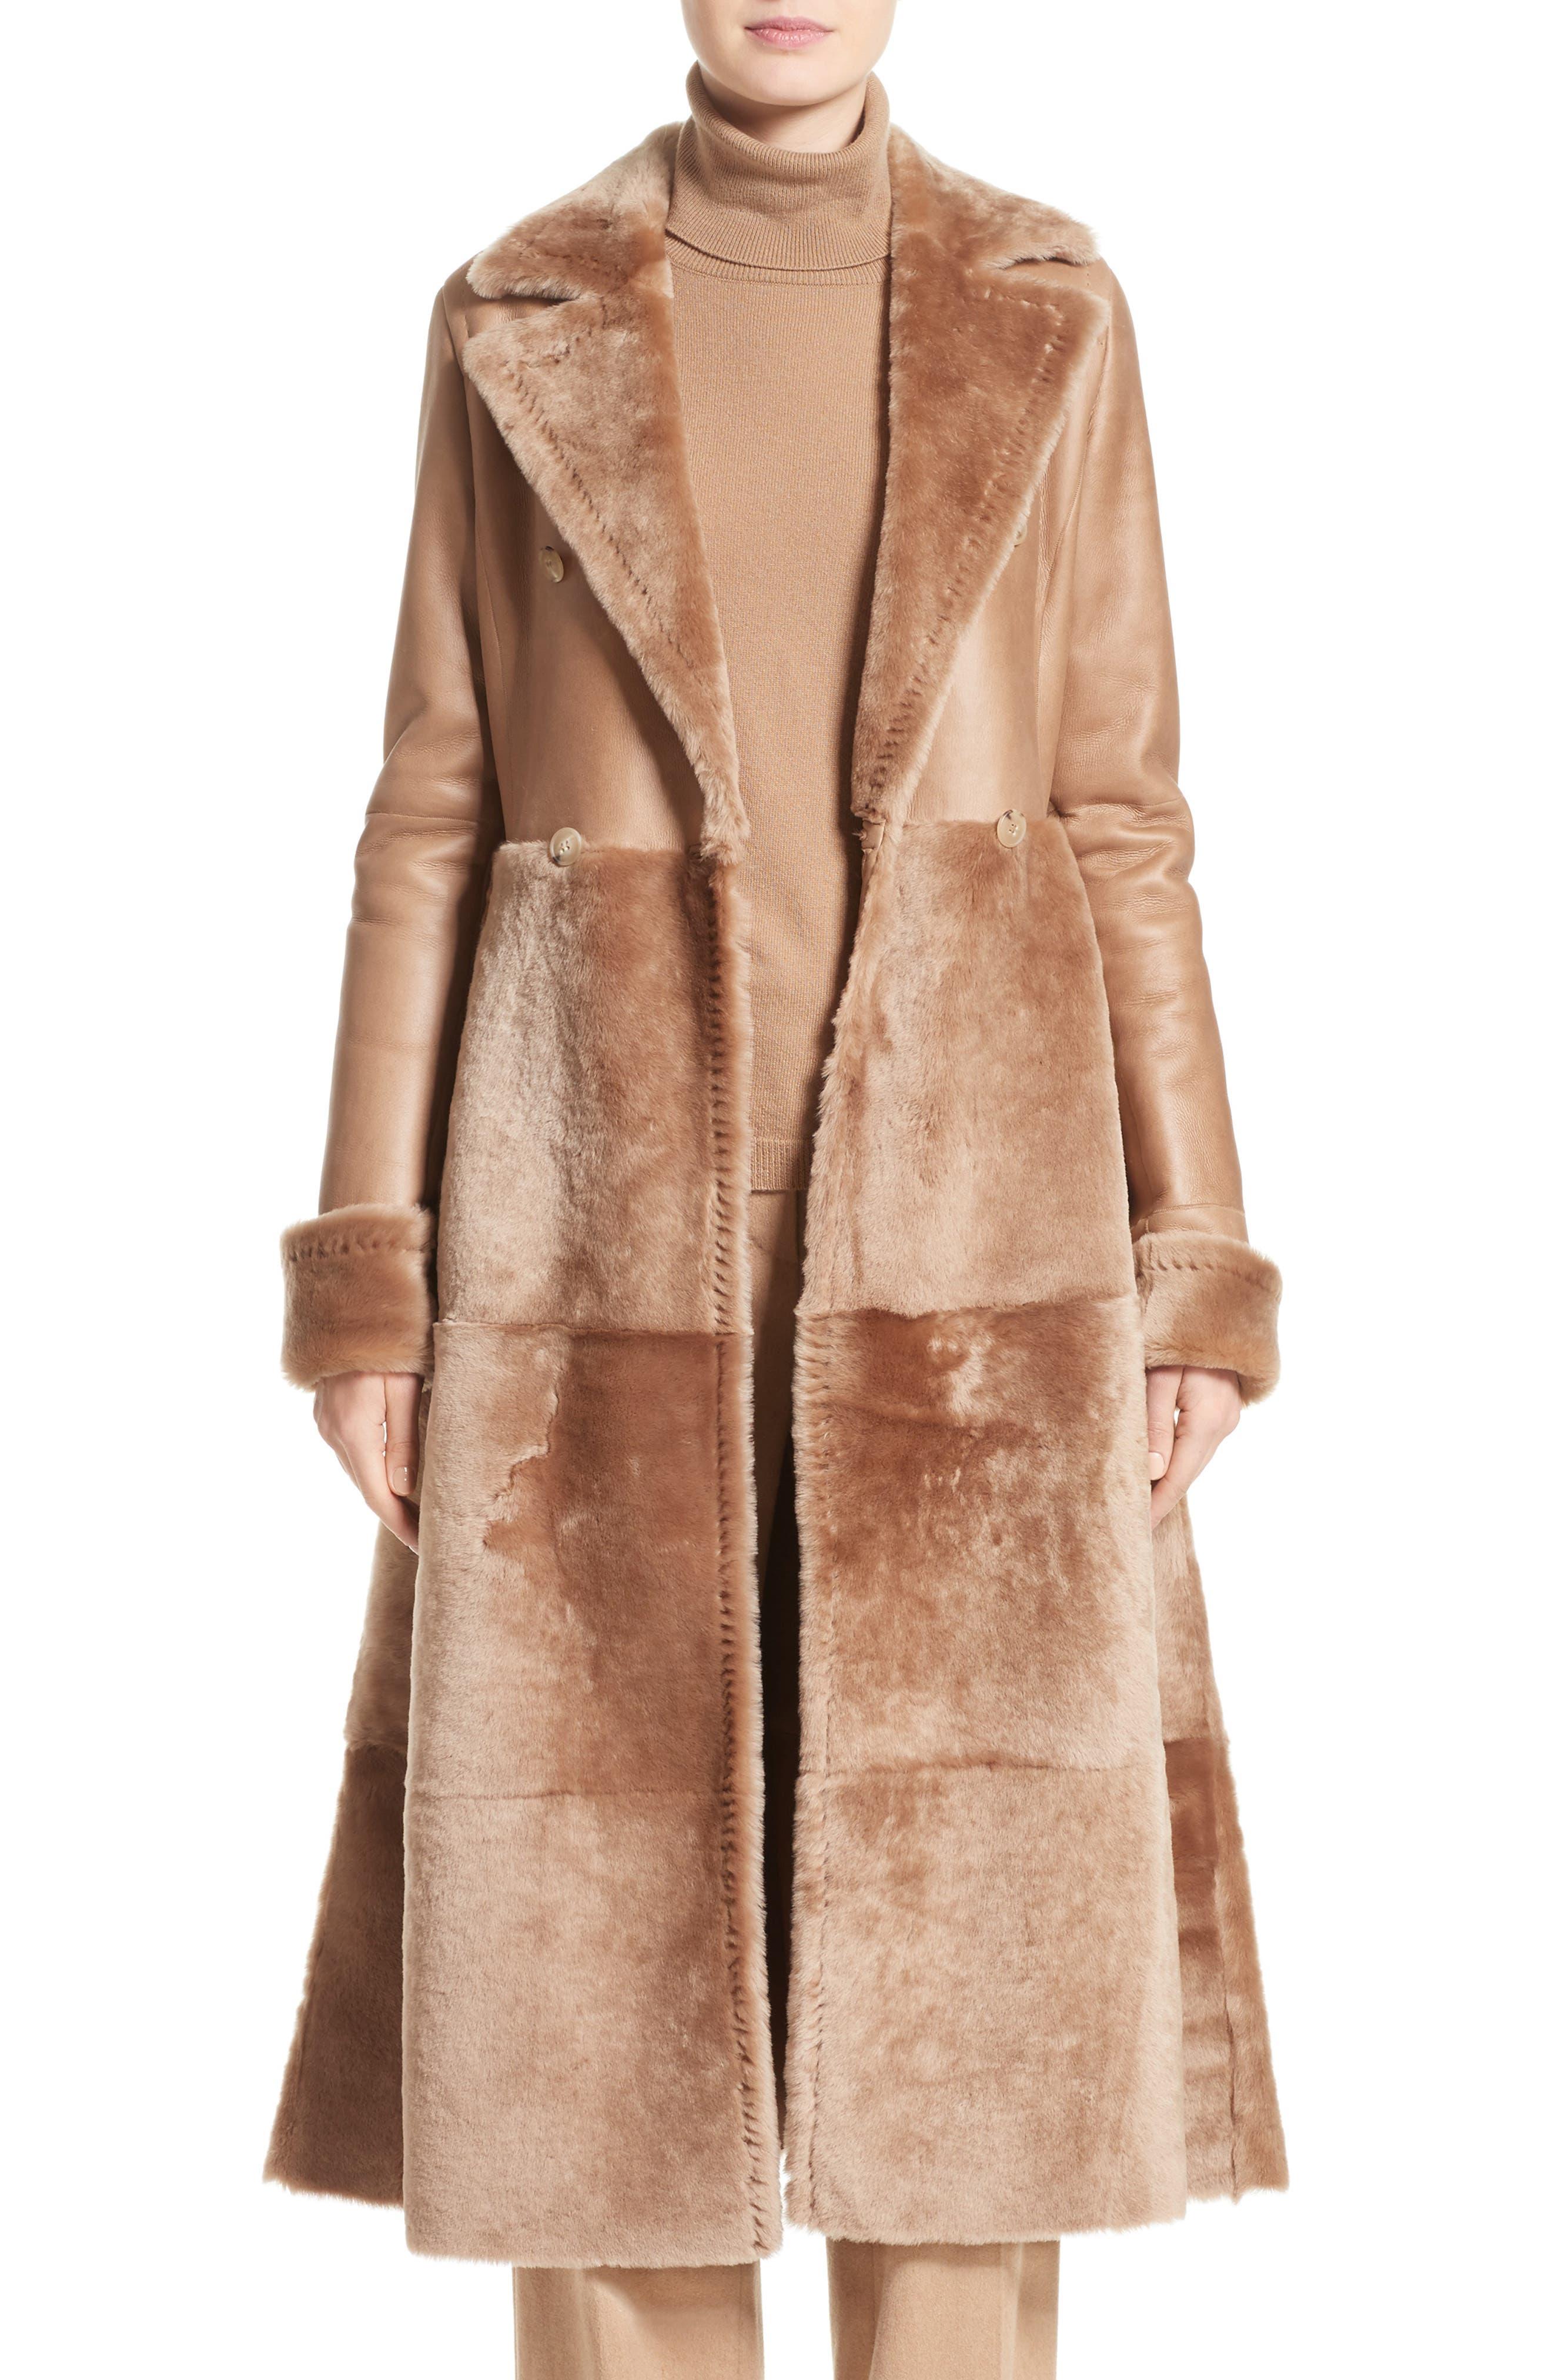 Rimini Genuine Shearling Coat,                             Main thumbnail 1, color,                             CAMEL